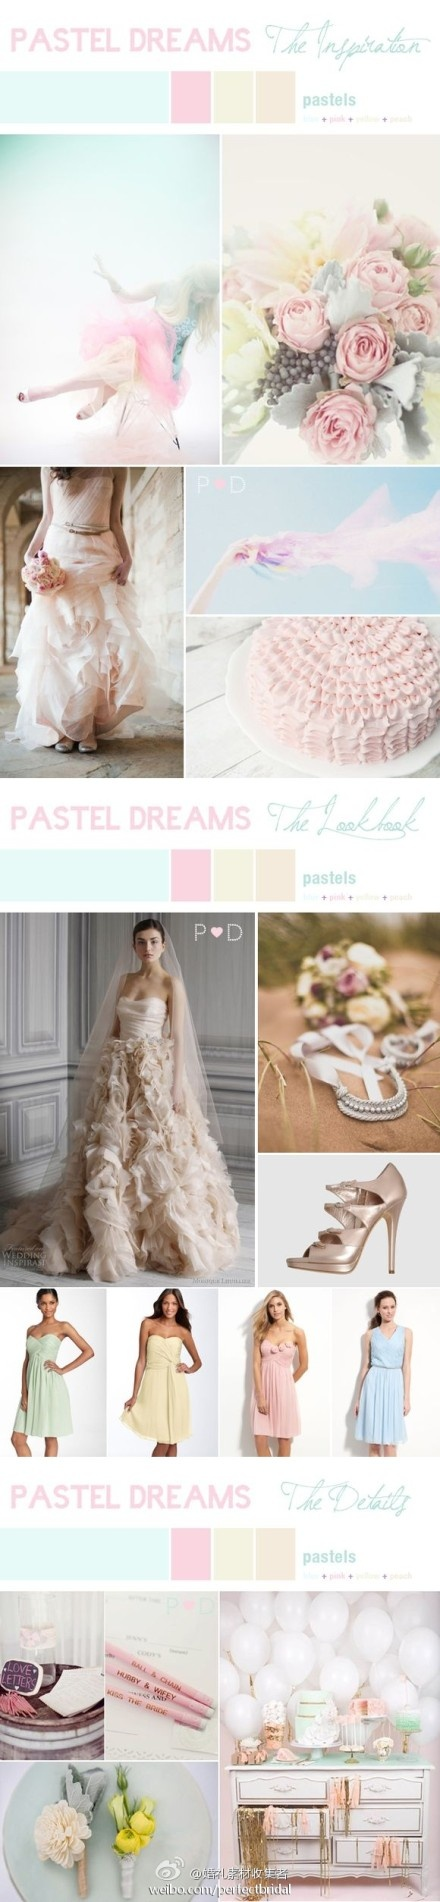 14 best Movie Inspired Engagement/Wedding images on Pinterest ...